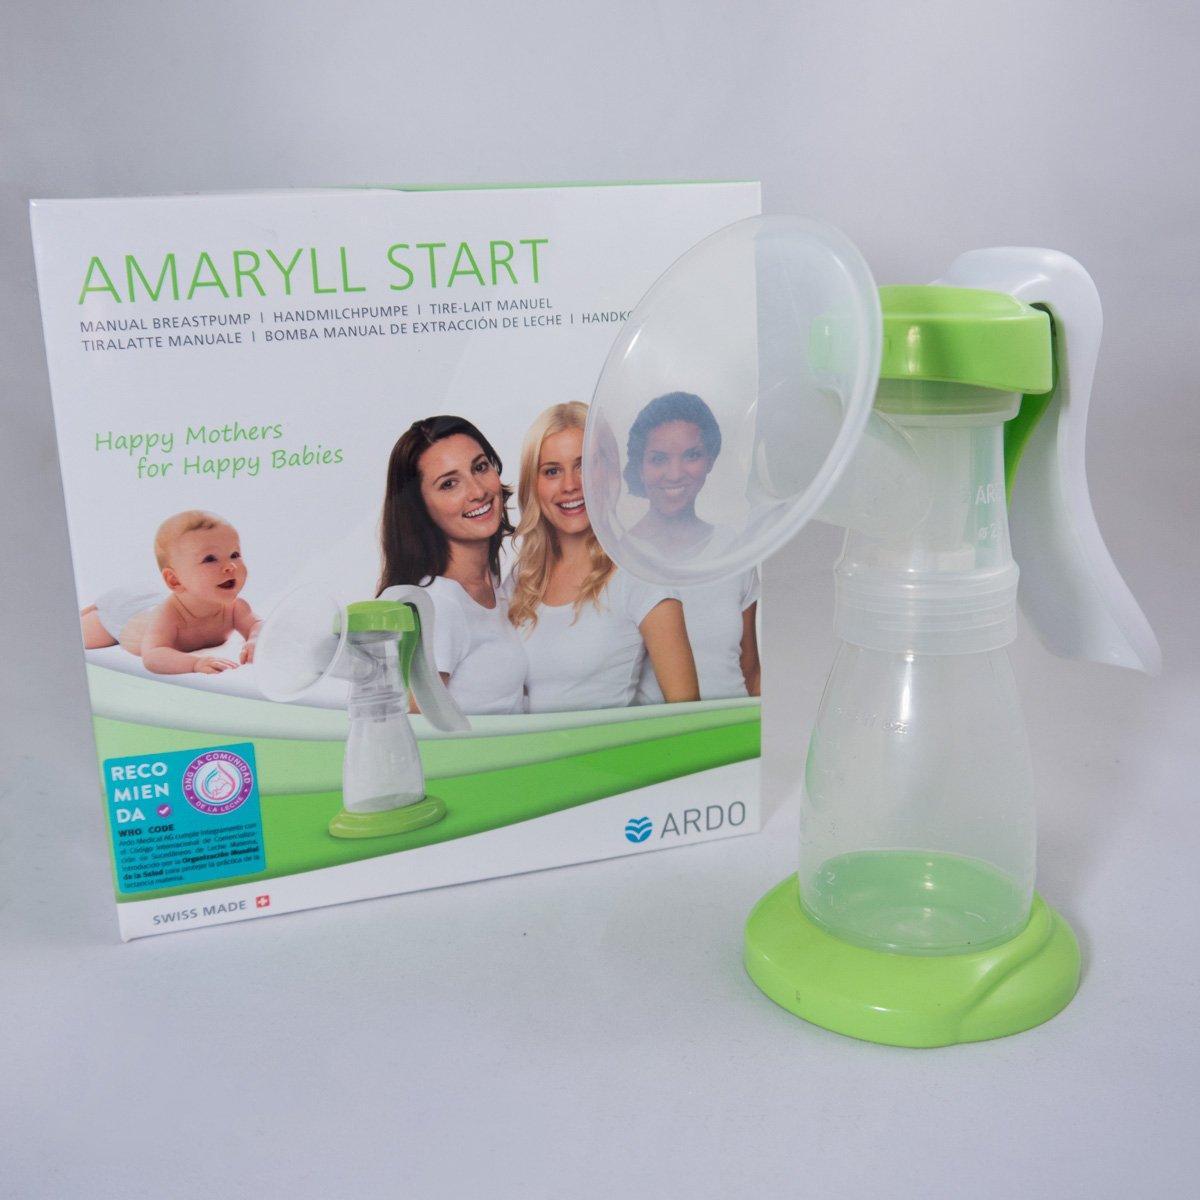 Sacaleches manual Ardo Amaryll Start